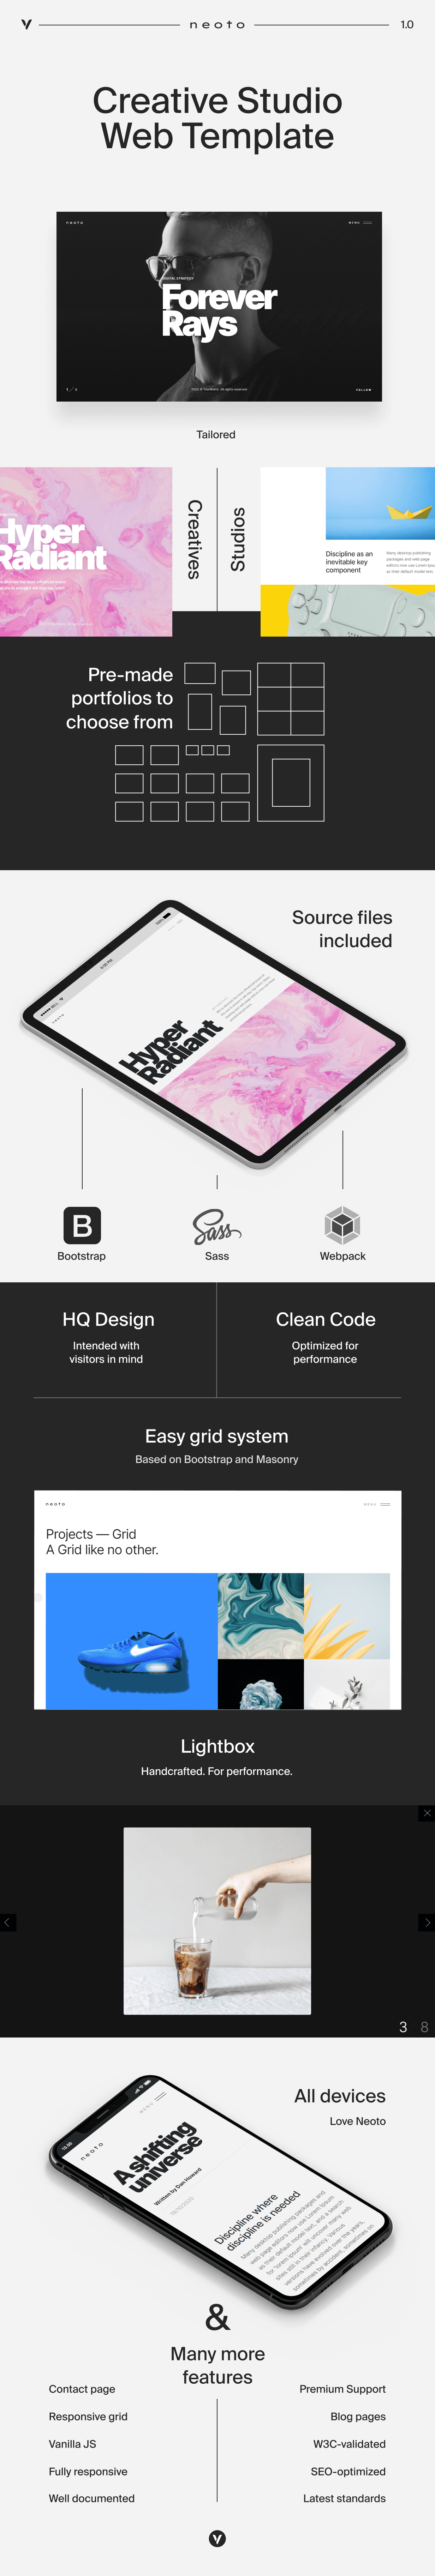 Neoto - Creative Studio Portfolio Template